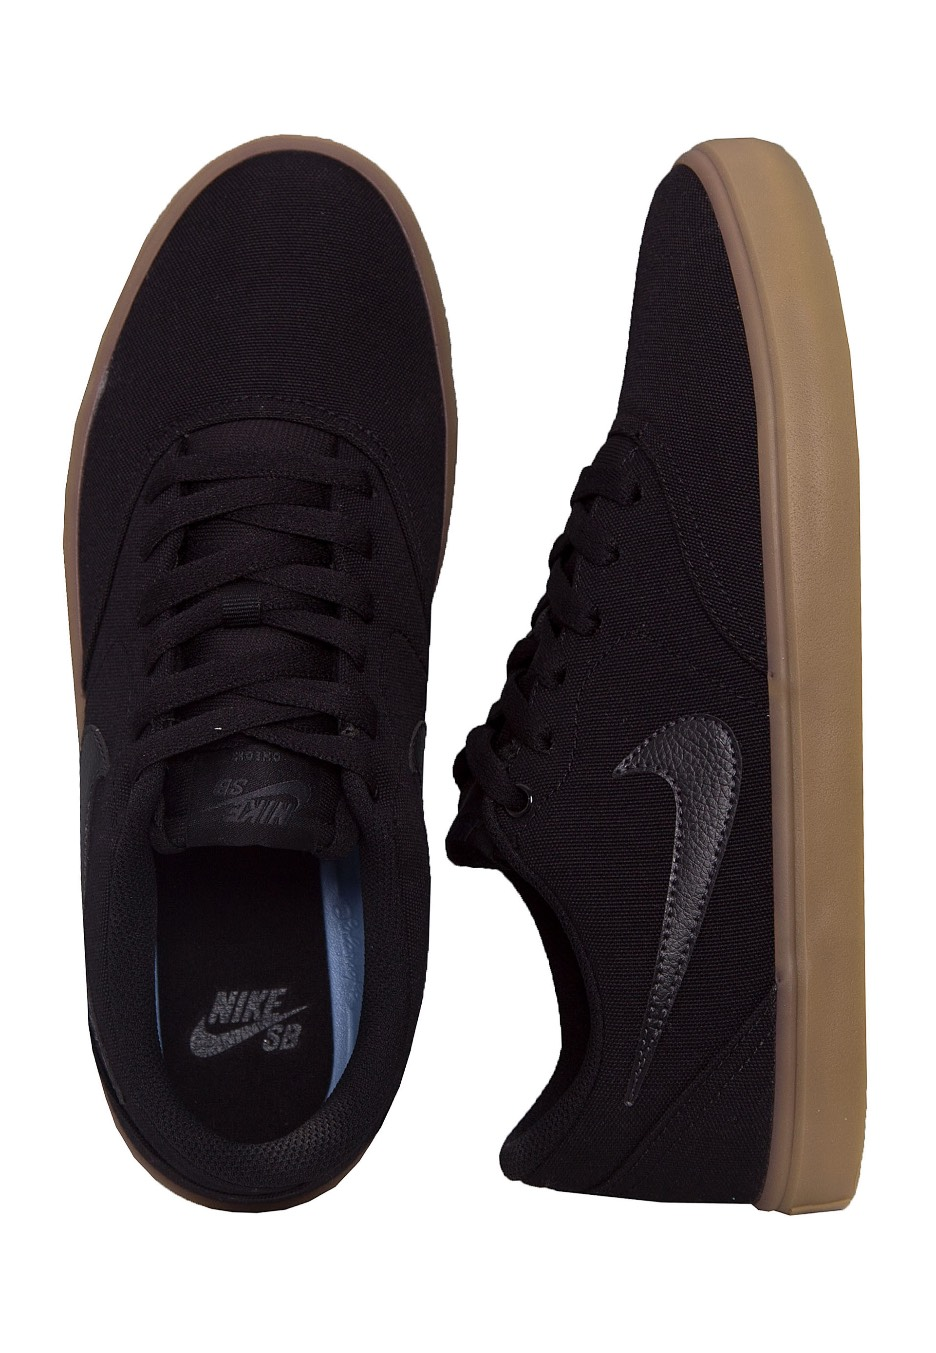 wholesale dealer 49533 4fb74 Nike - SB Check Solarsoft Canvas Skateboarding Black Black Gum Light Brown  - Shoes - Streetwear Shop - Impericon.com UK